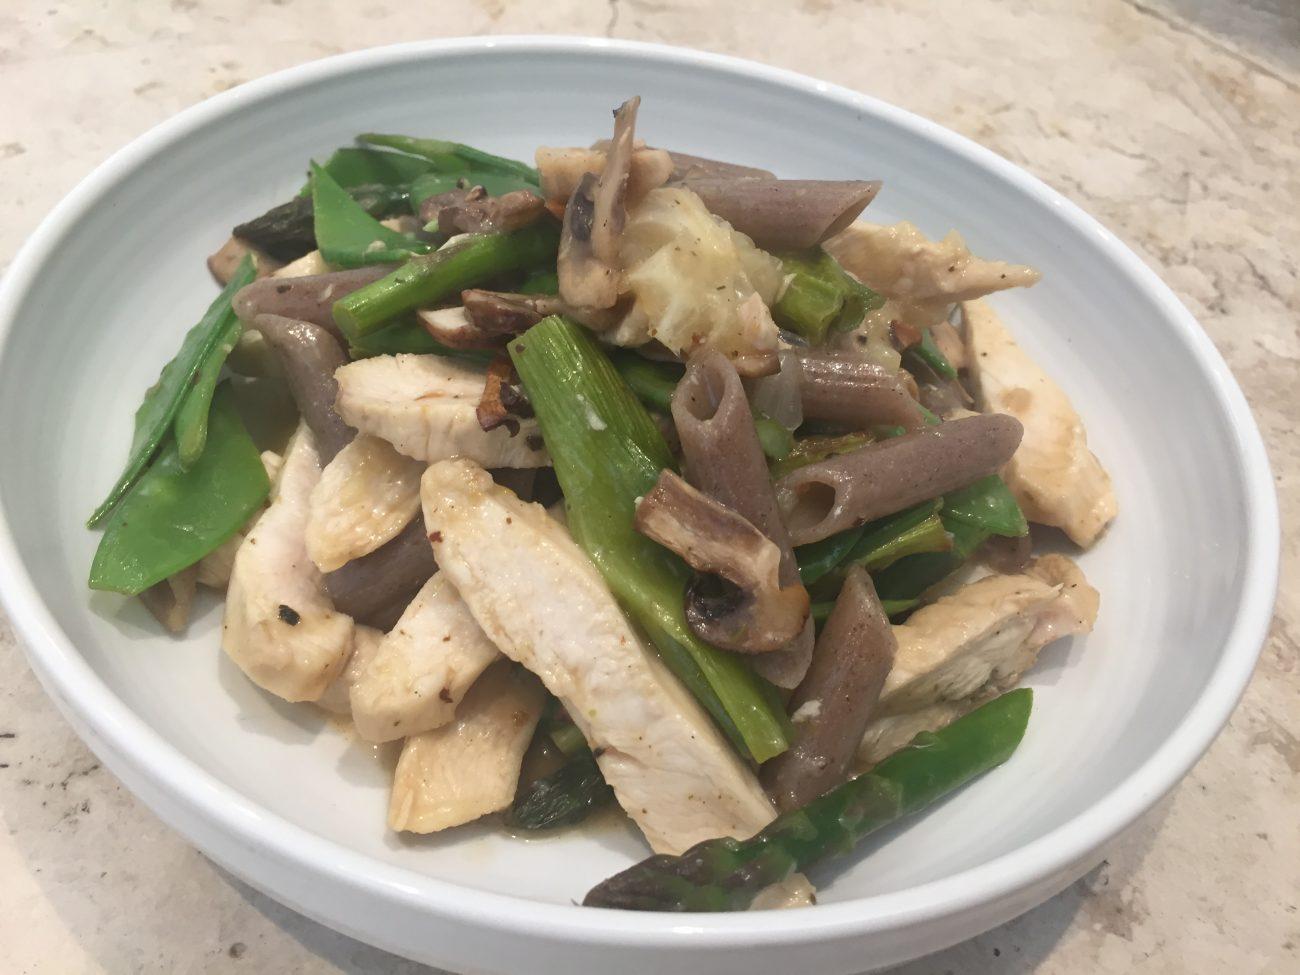 Spring veg and Lemon Chicken Pasta